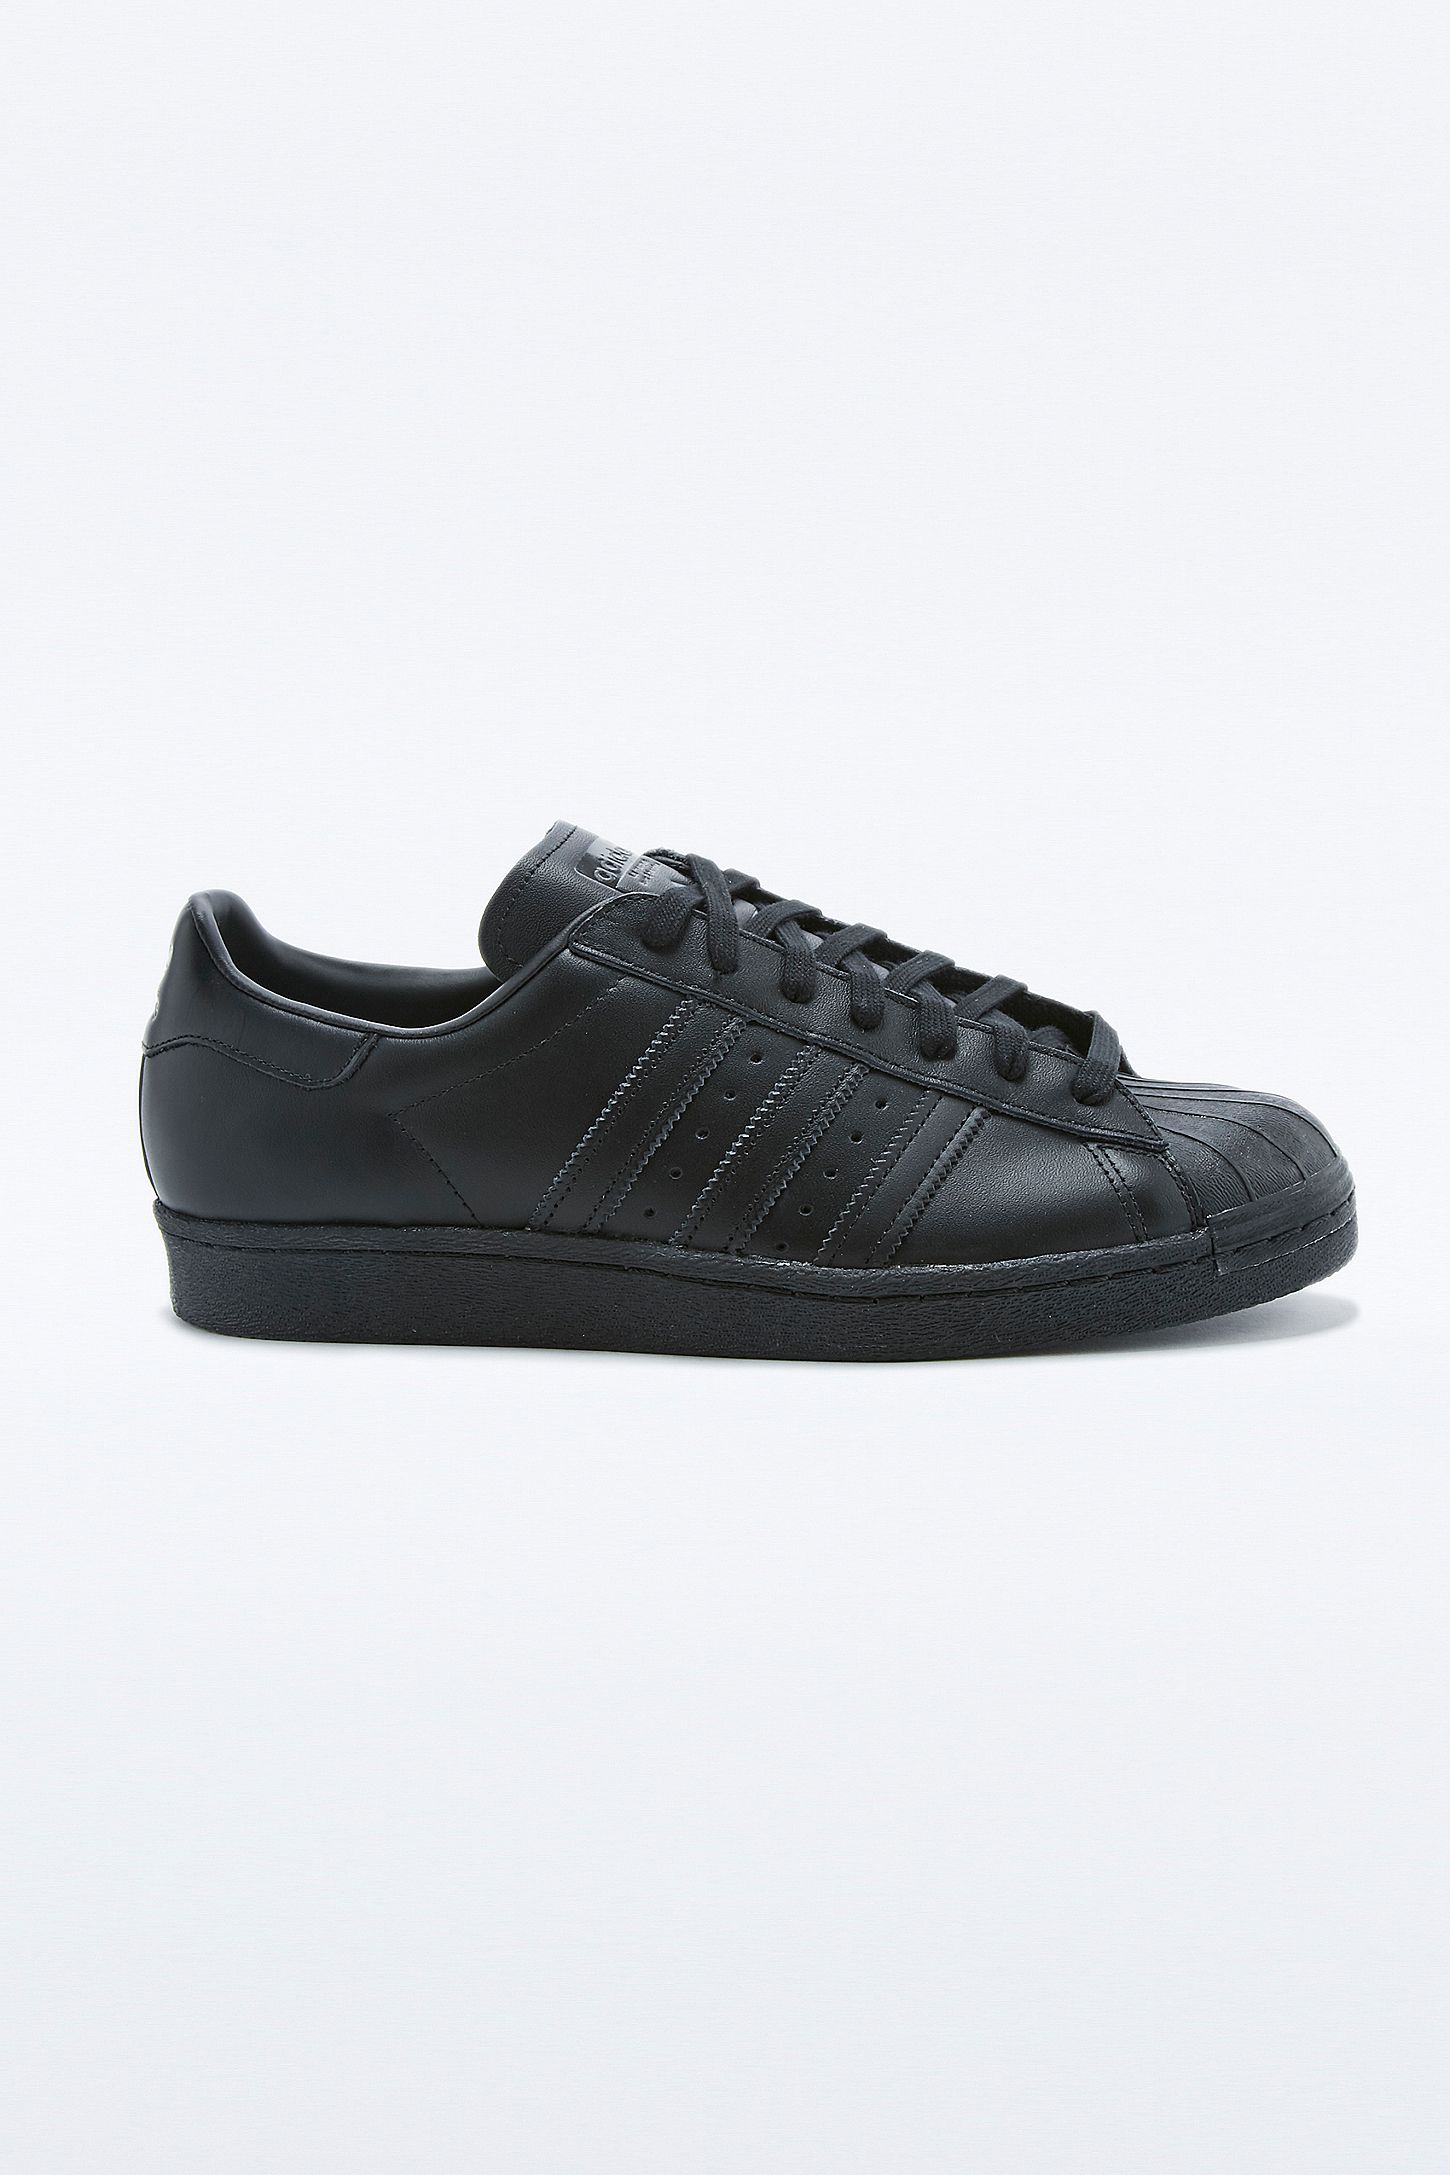 shopping adidas samba primeknit vendita kit 53ed5 9a61e